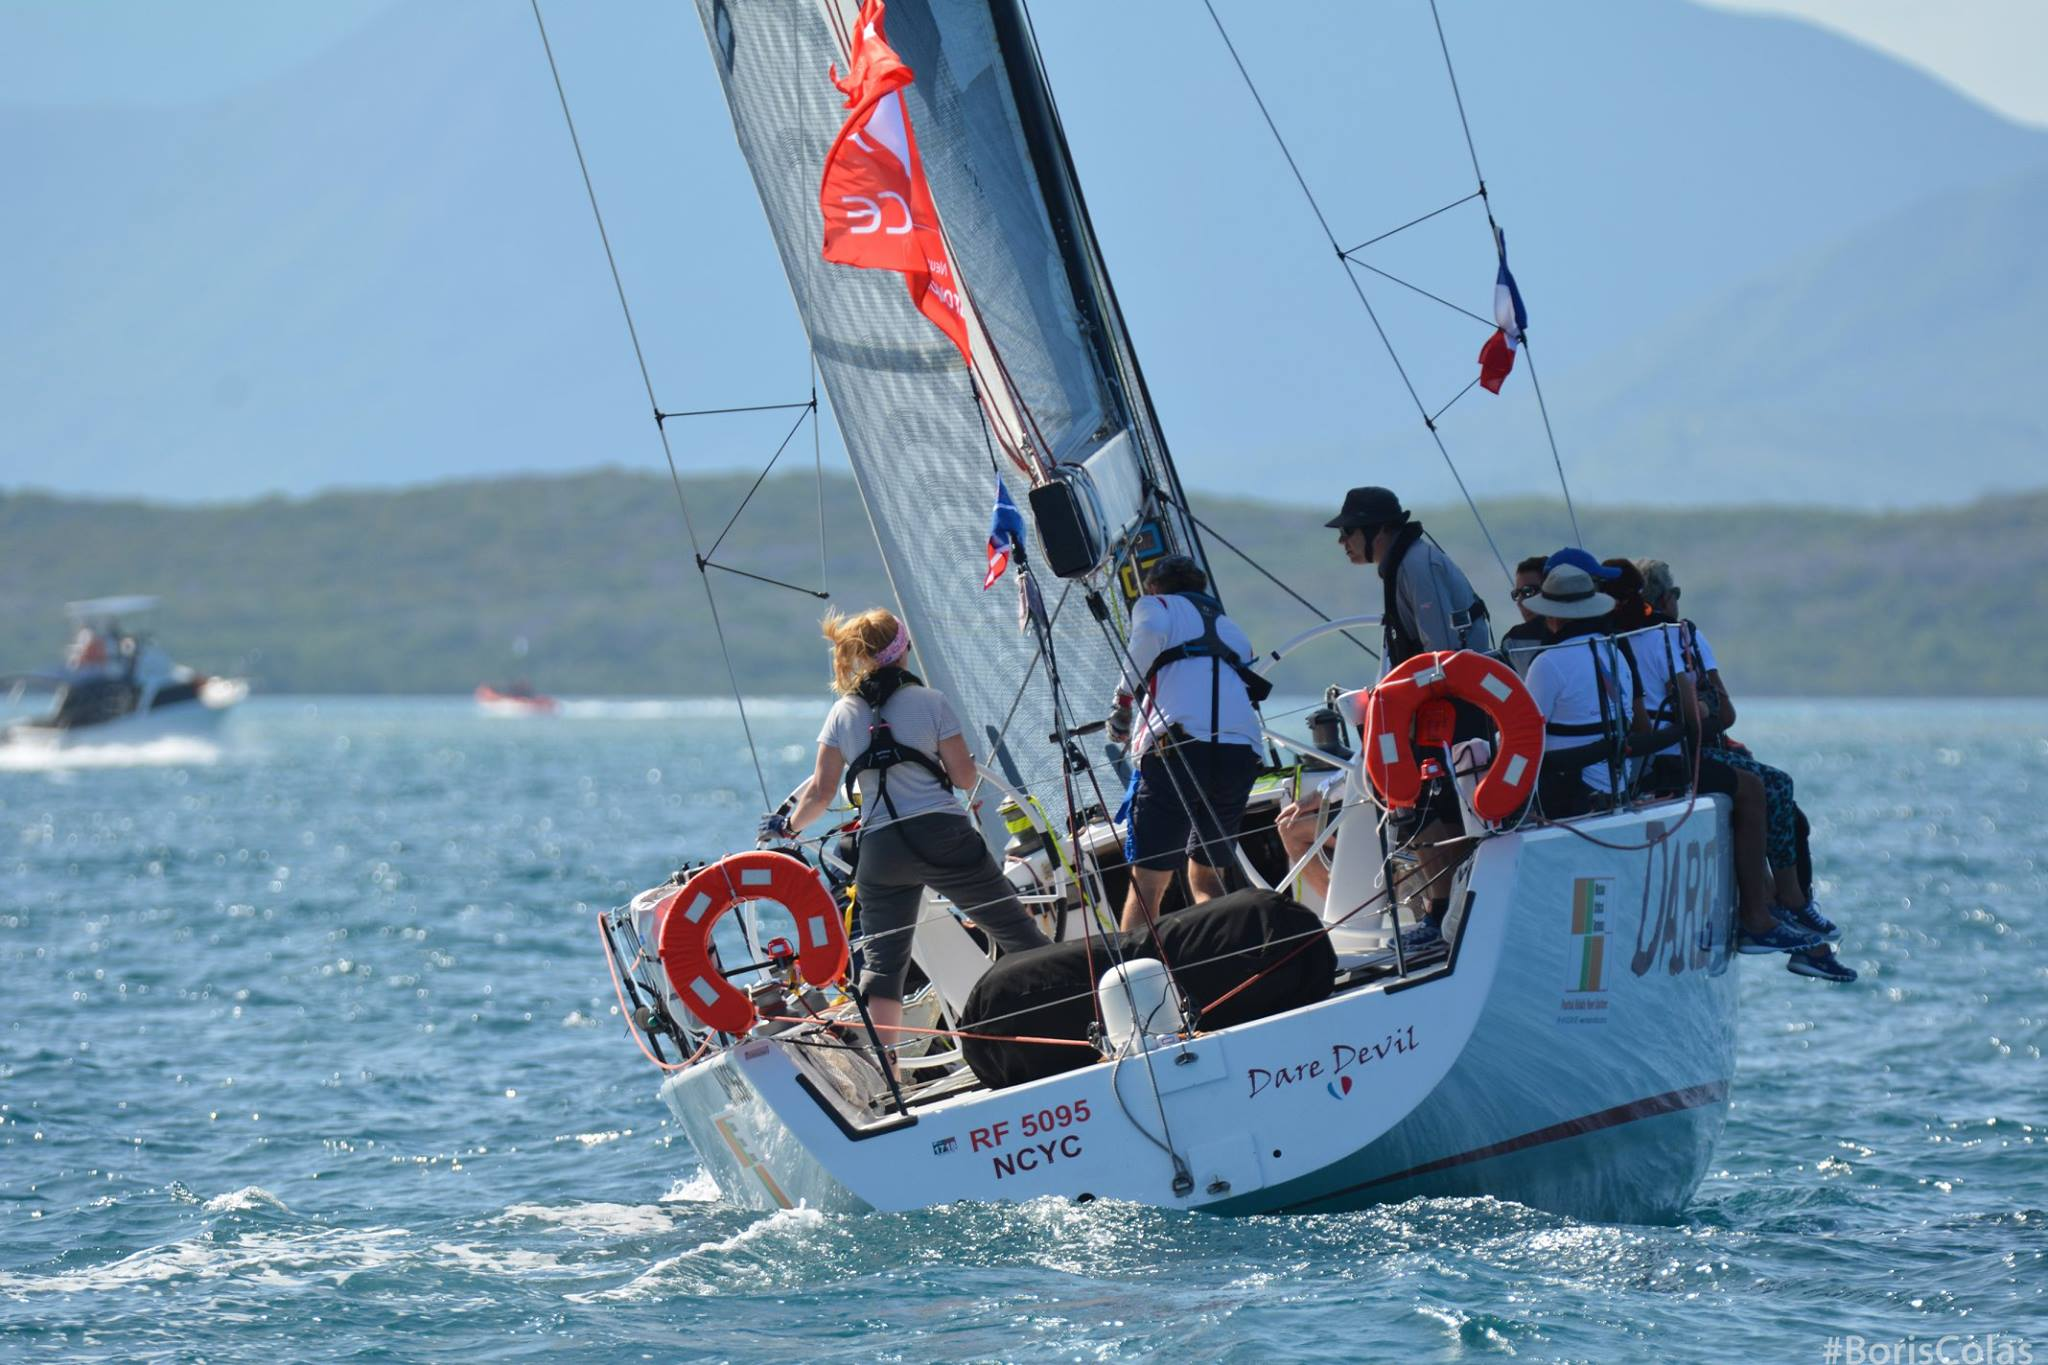 New Caledonia Groupama Race Sibby Ilzhofer's Dare Devil (AUS) Groupama 2018. Photo Boris Colas